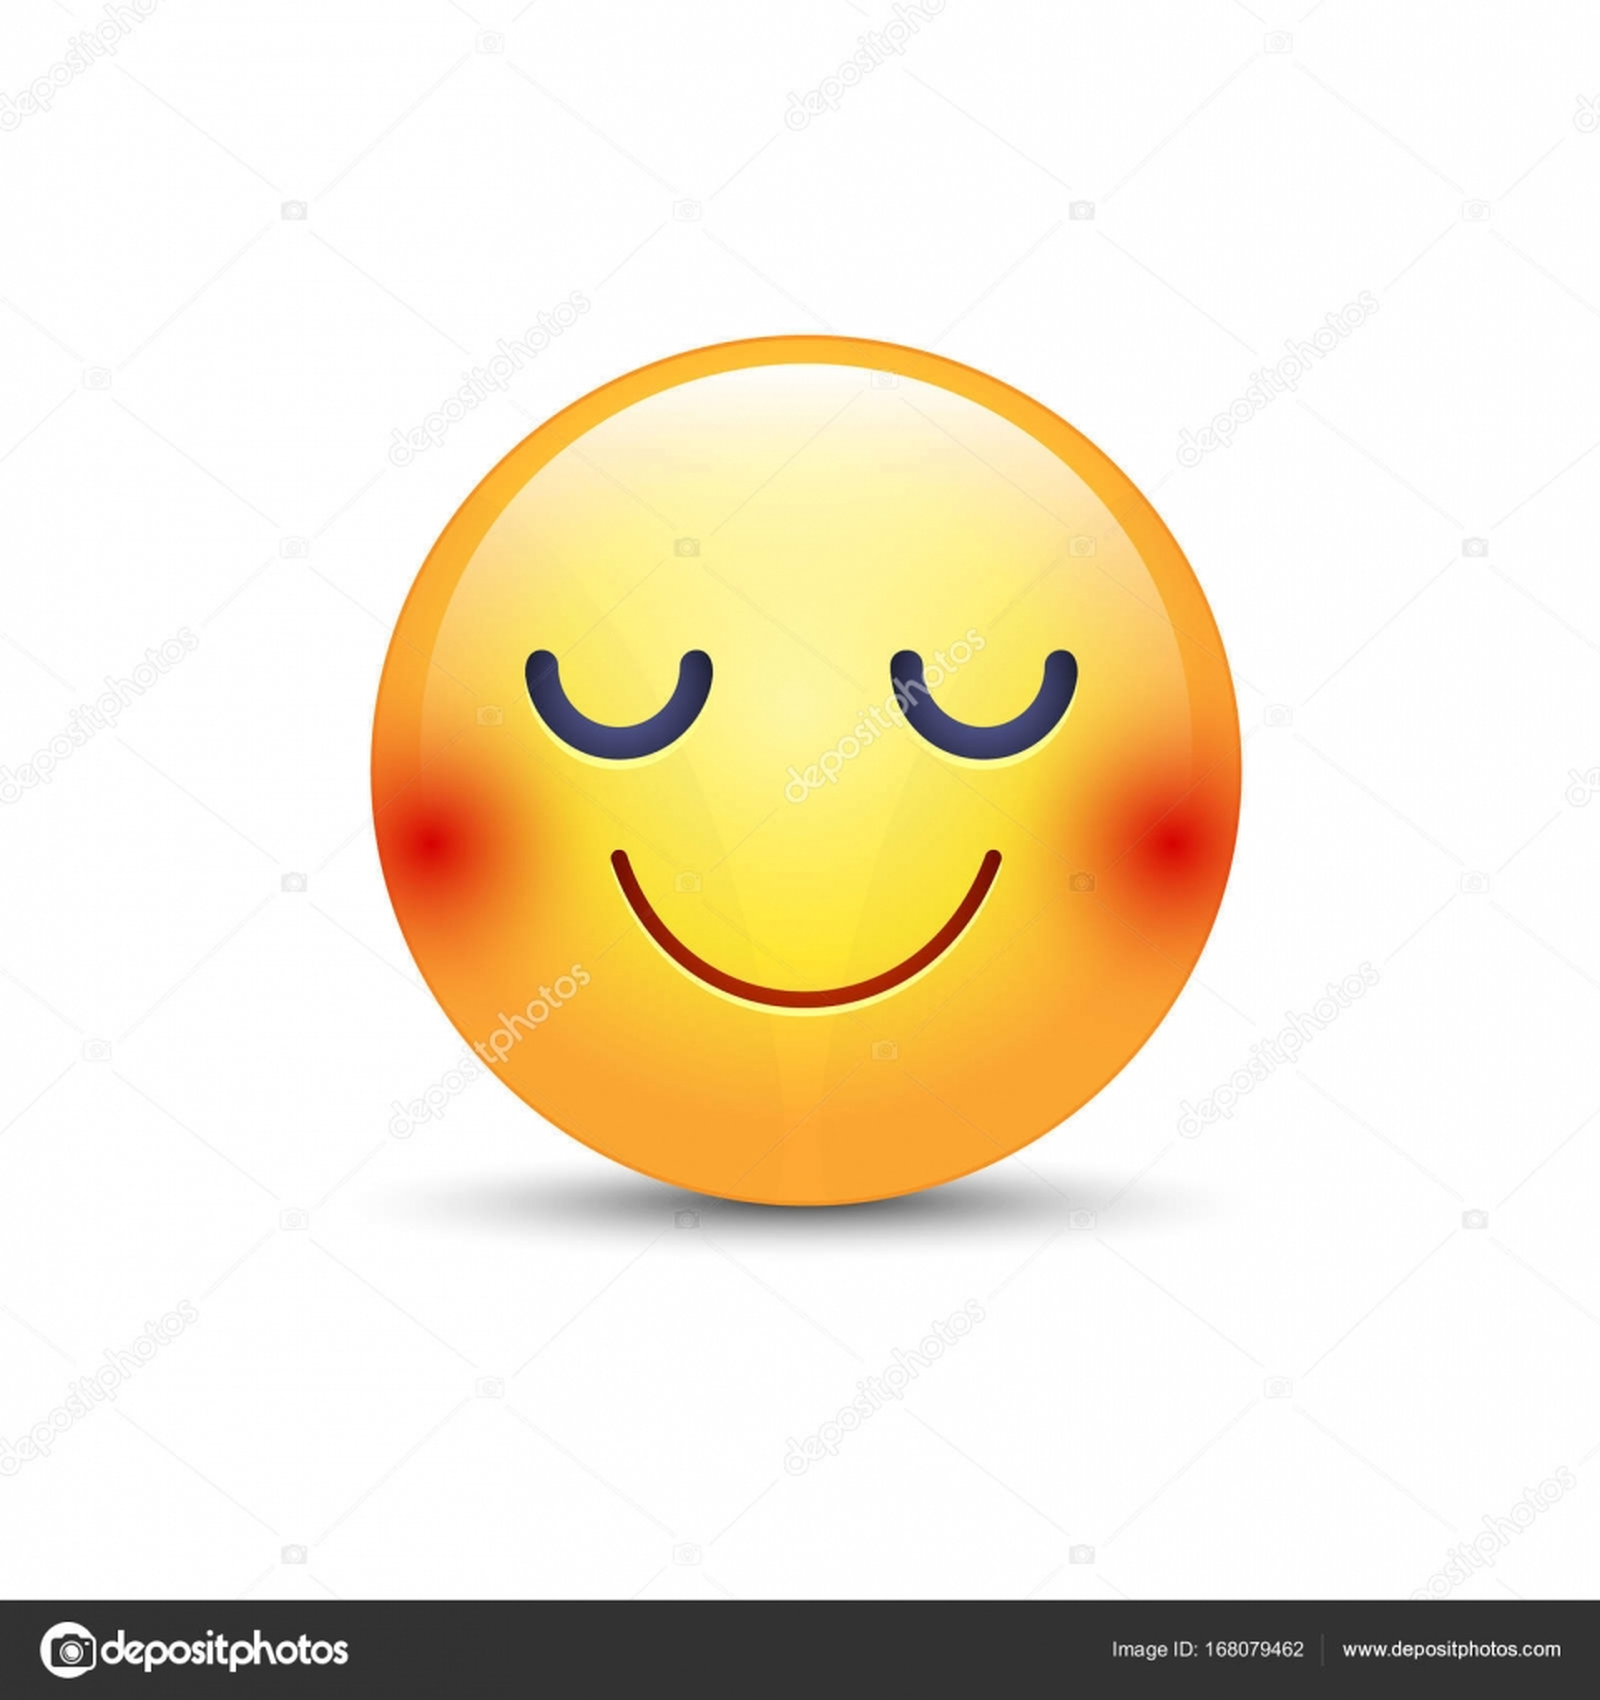 dessin anim heureux emoji visage aux yeux ferms sourire jaune mignon moticne smiley fun - Dessin Emoji